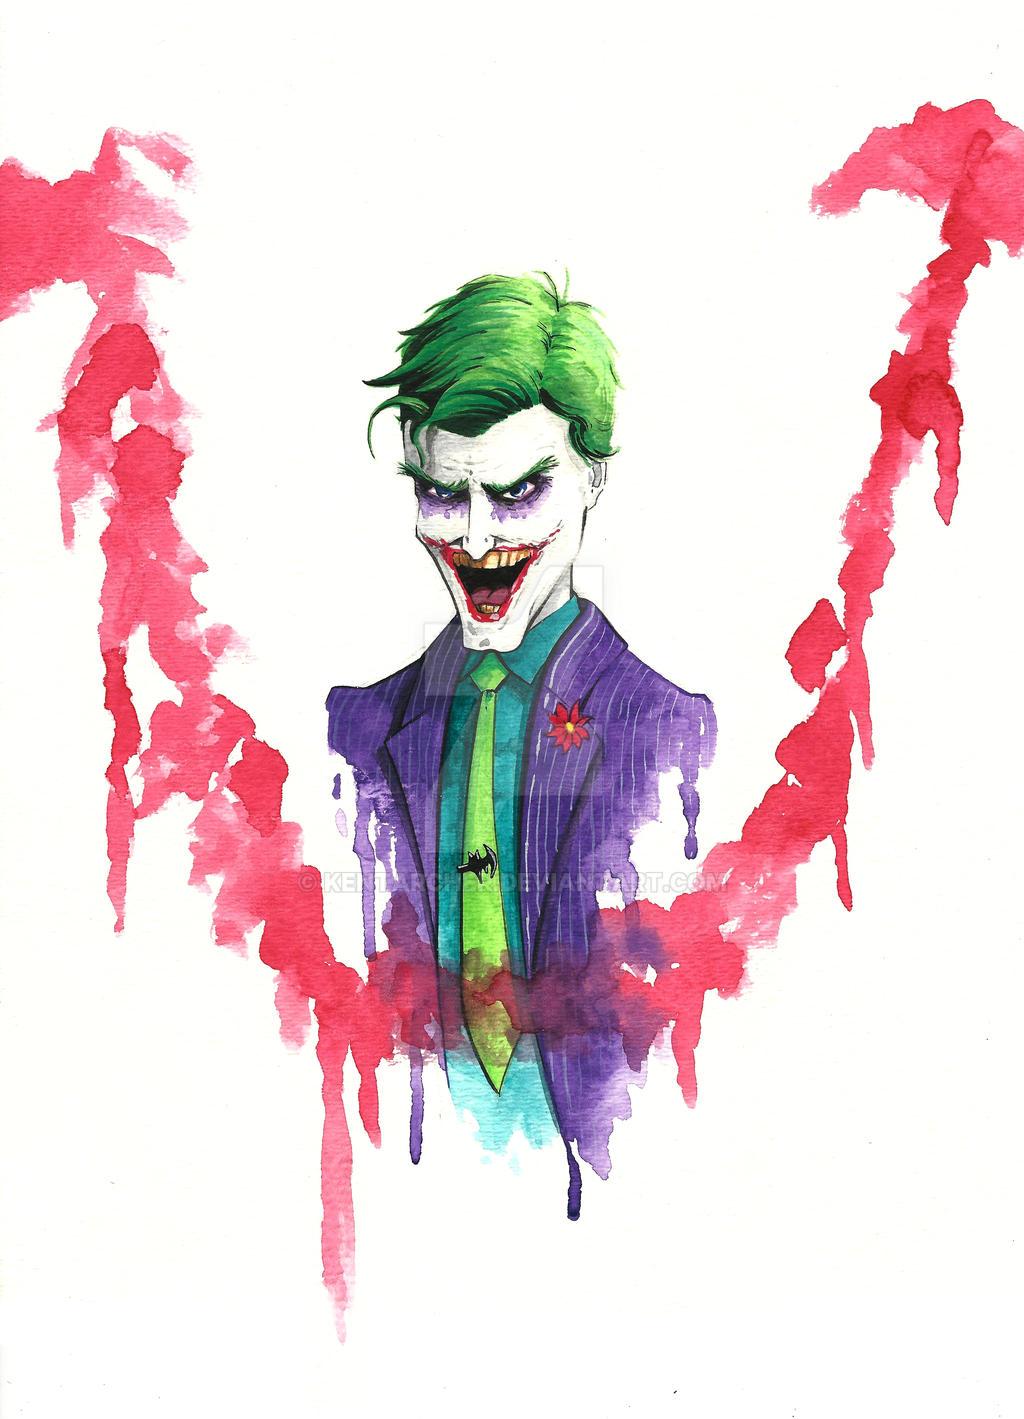 Joker by kentarcher